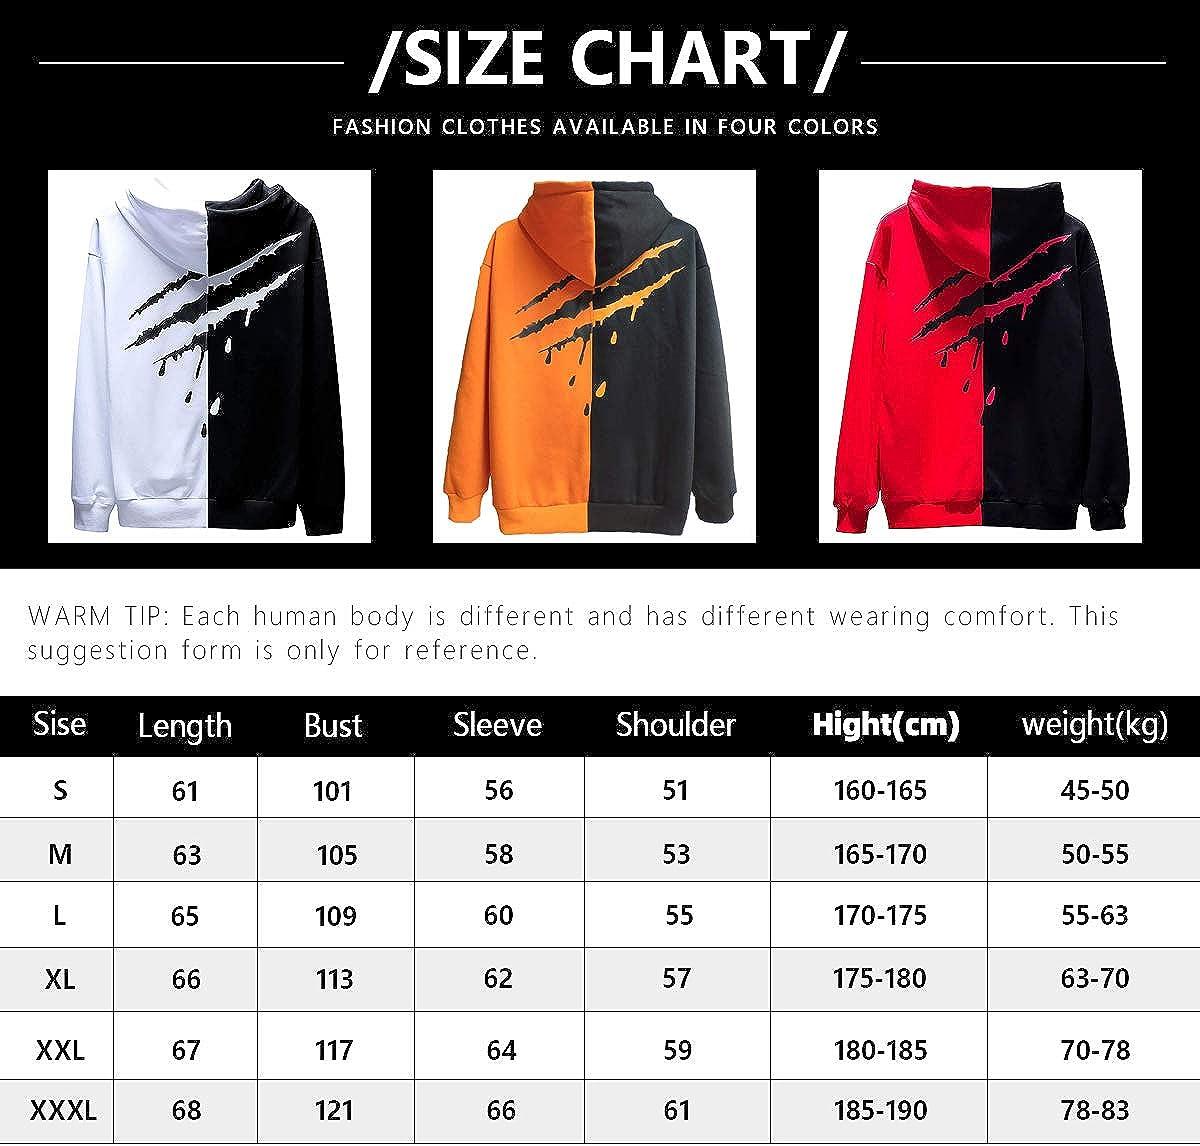 XIAOYAO Men/'s Sweatshirt Hoodies Top Blouse Tracksuits Long Sleeve Autumn Winter Casual